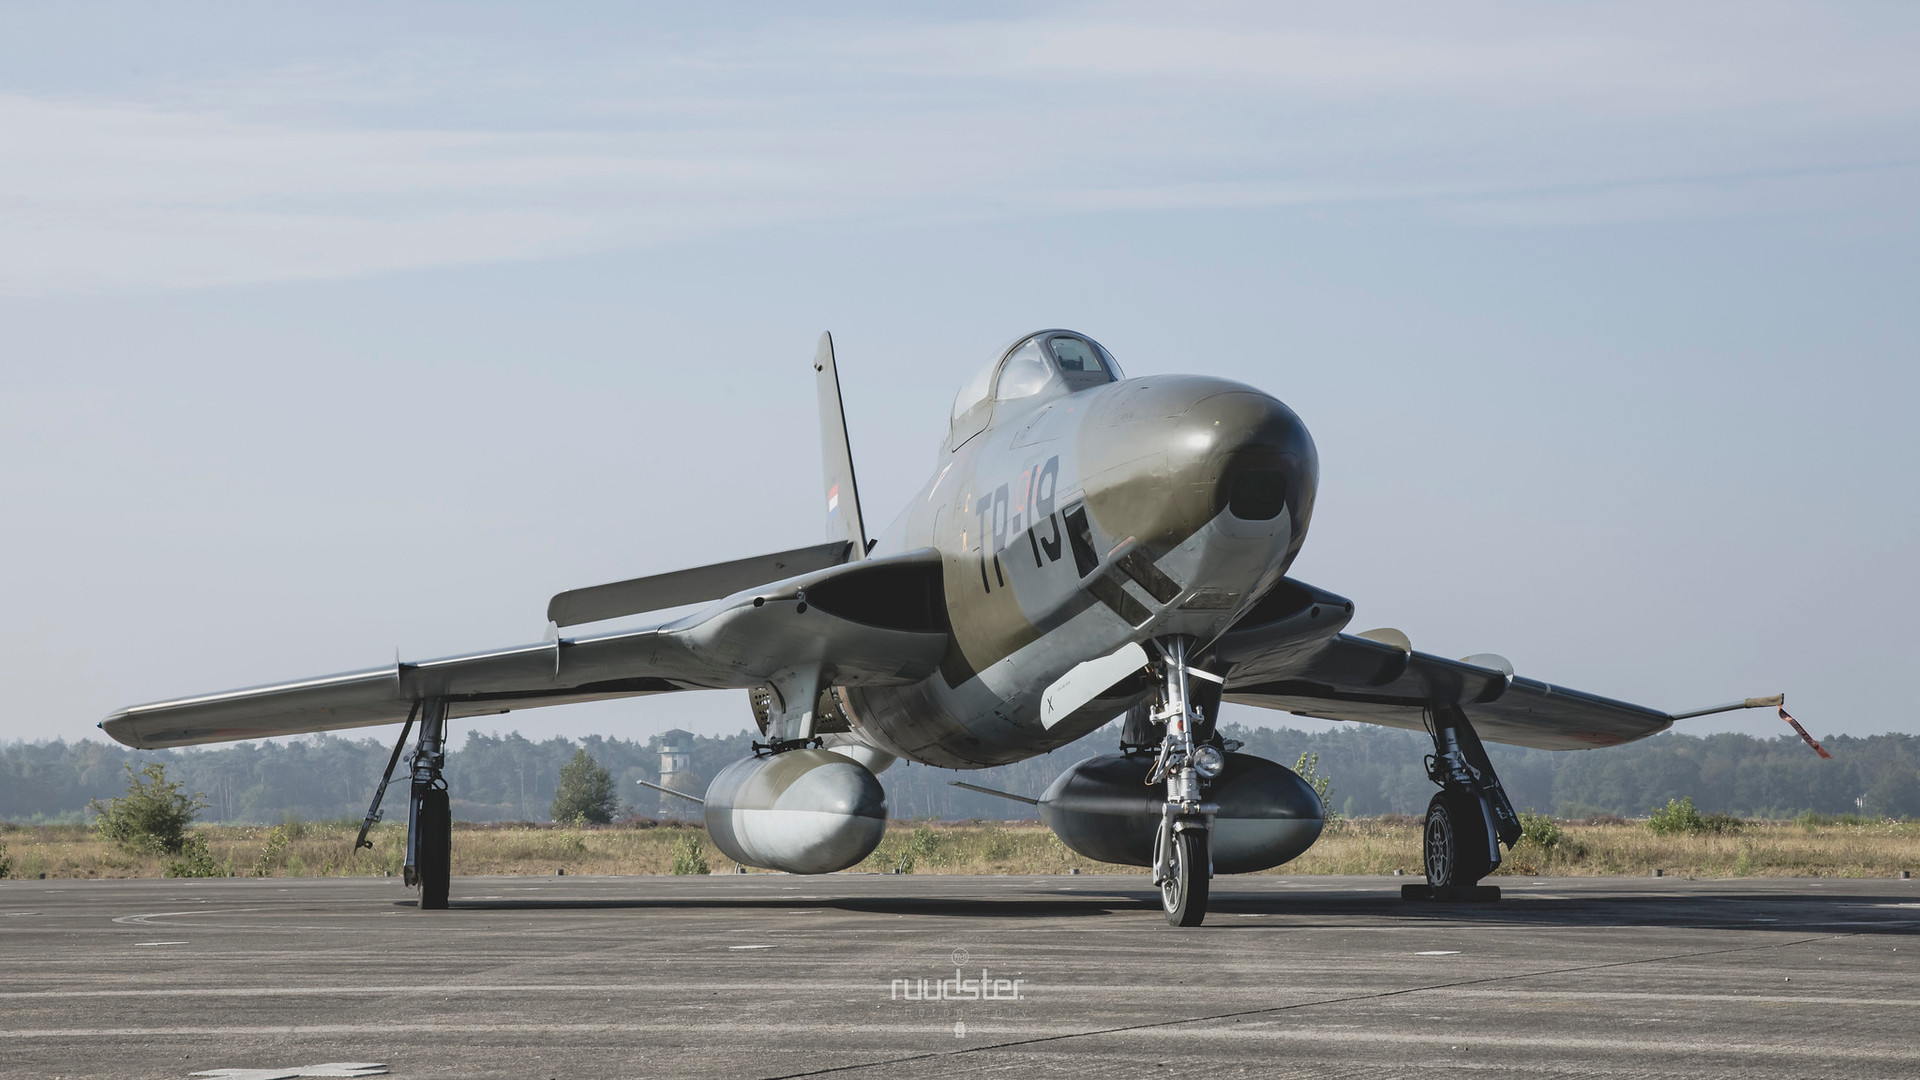 TP-19   Build: 1955 - Republic RF-84F Thunderflash